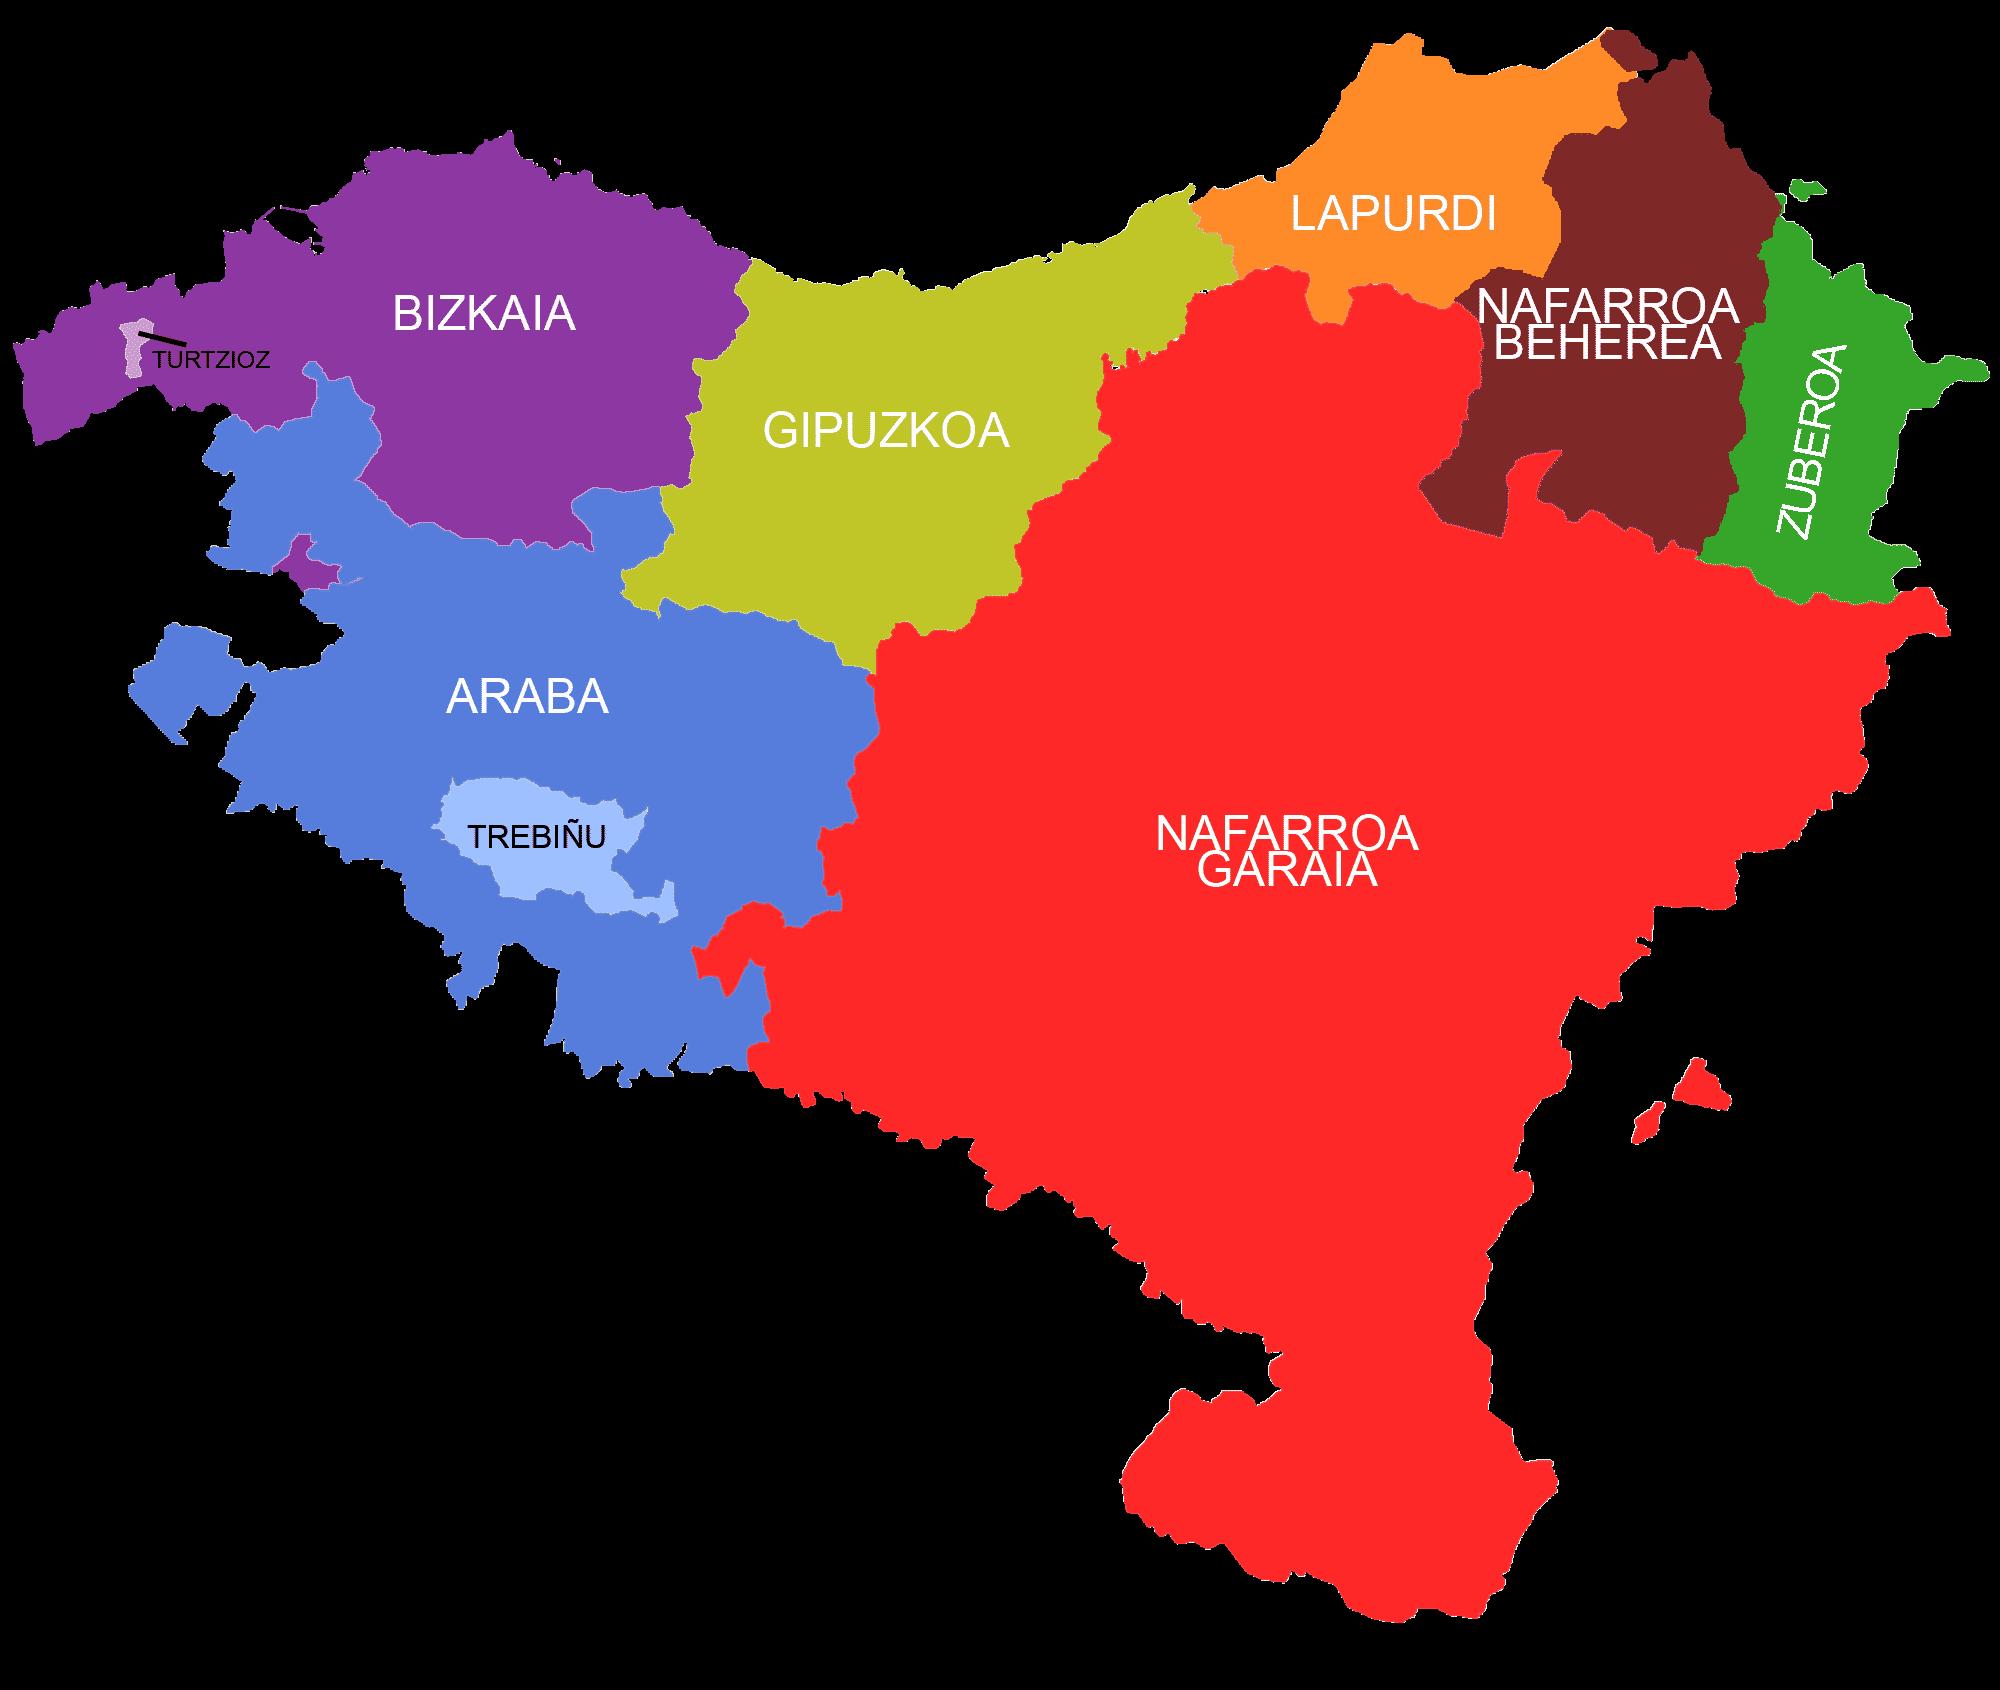 pais basco mapa File:Euskal Herriko mapa koloreztatua.png   Wikimedia Commons pais basco mapa